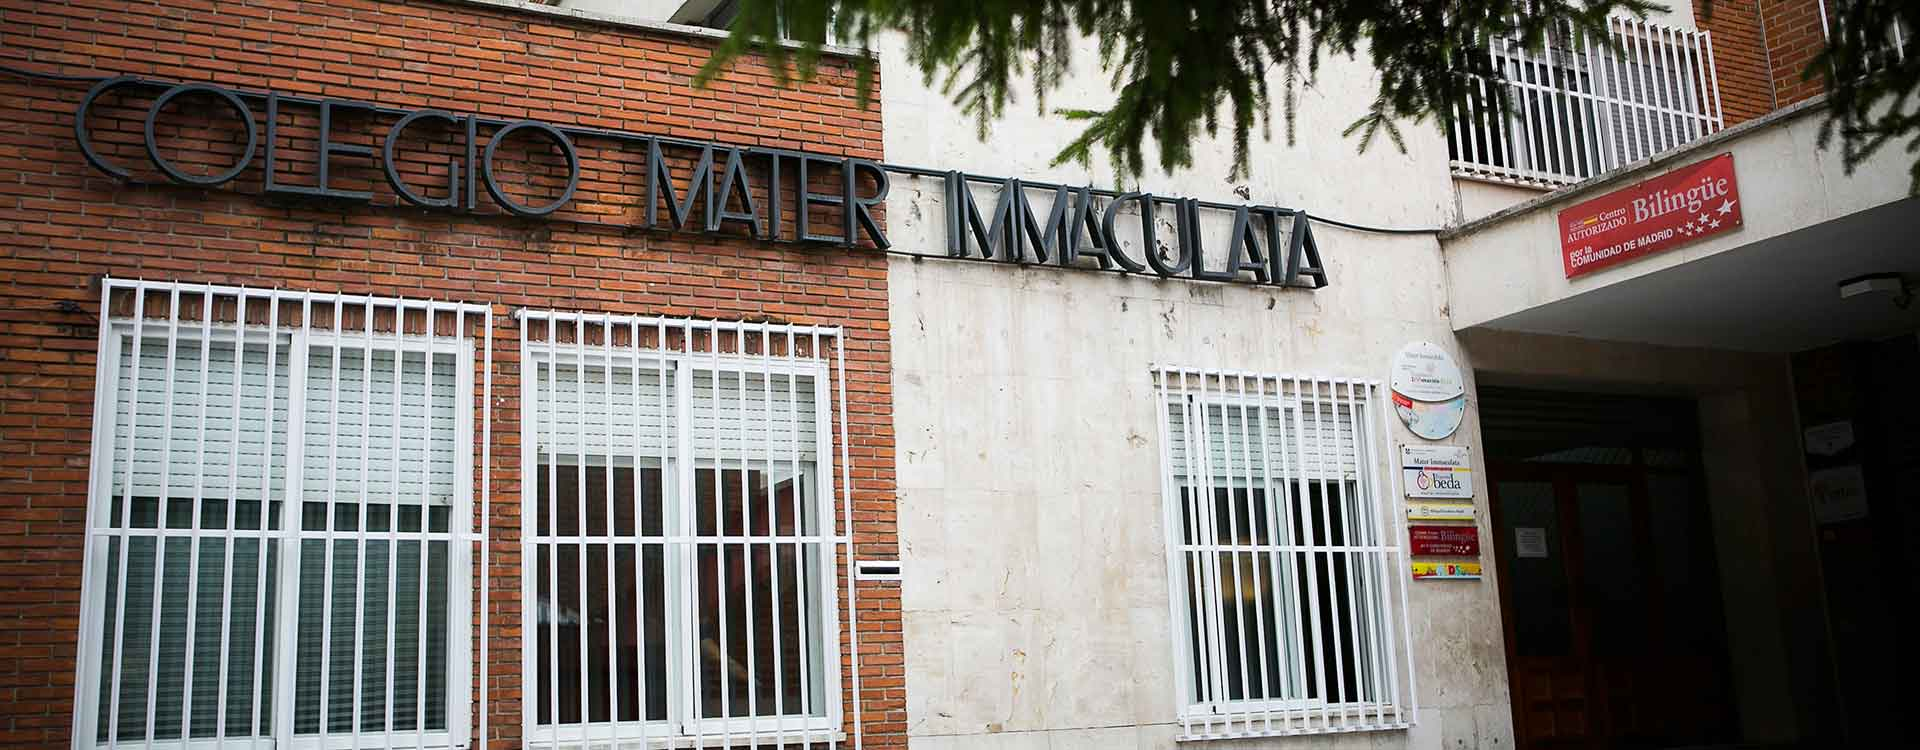 Instalaciones - Mater Immaculata